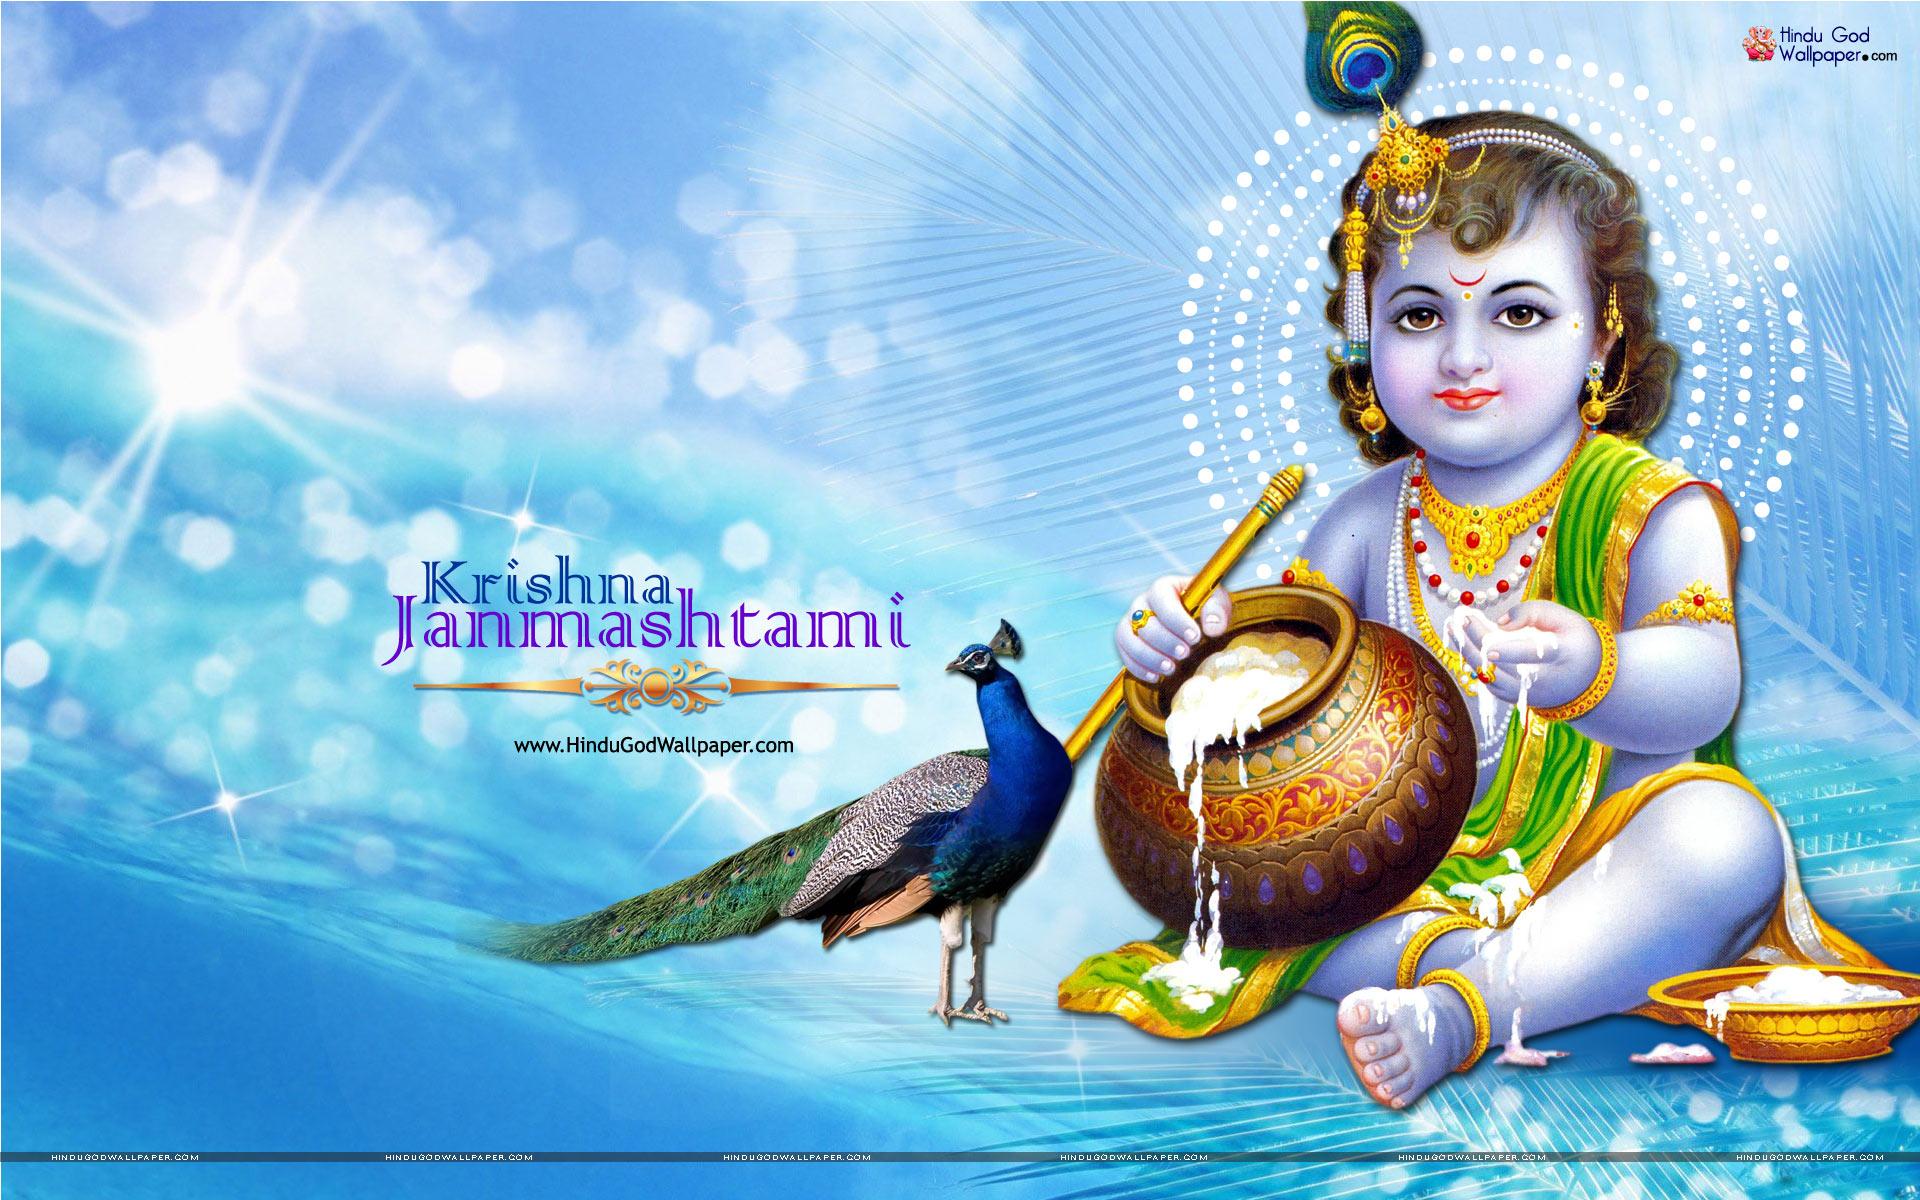 Krishna Janmashtami Animation Wallpaper Download